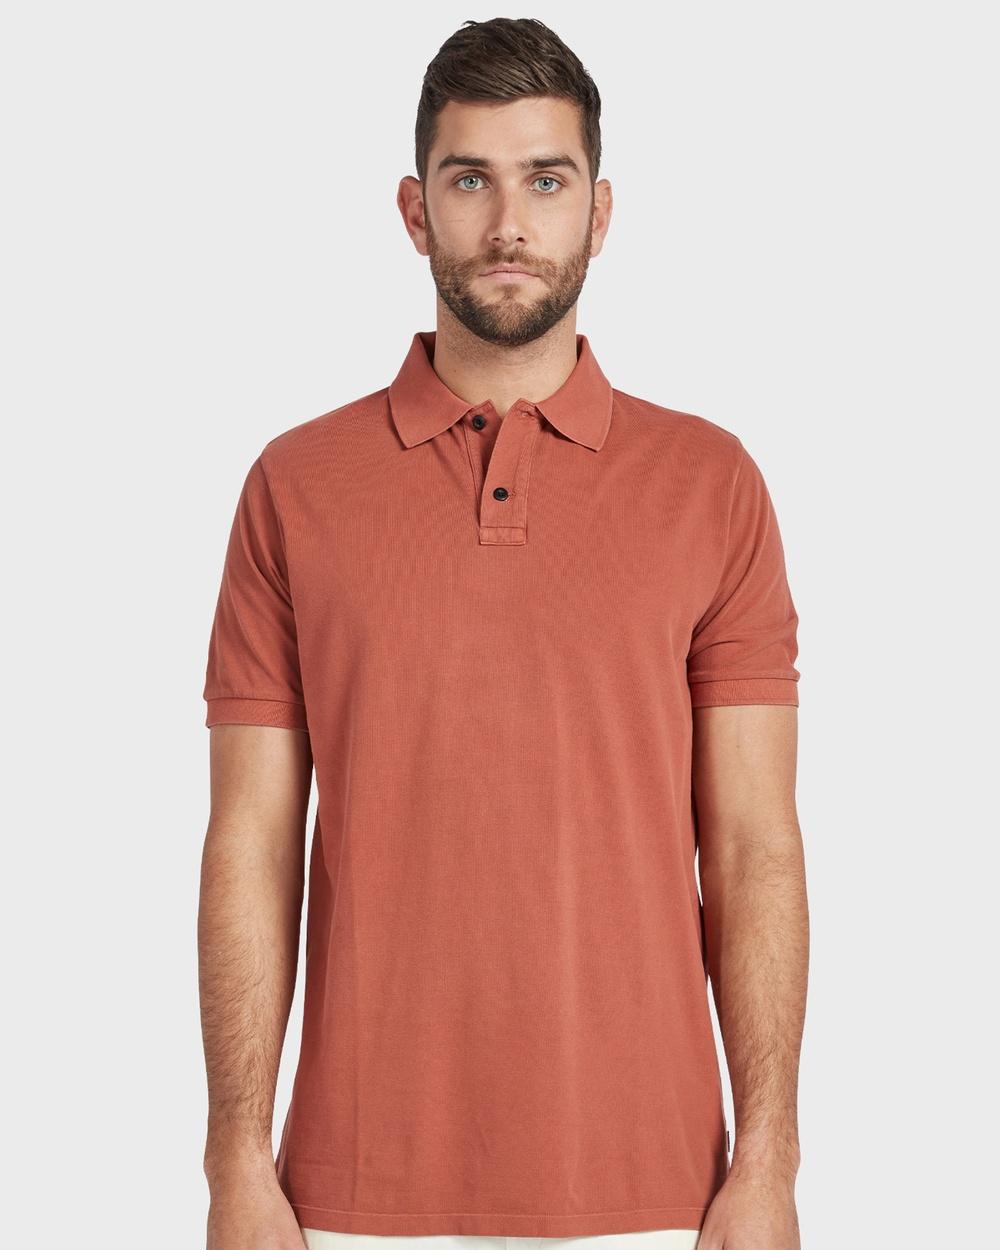 Academy Brand Polo Shirts & Polos Orange